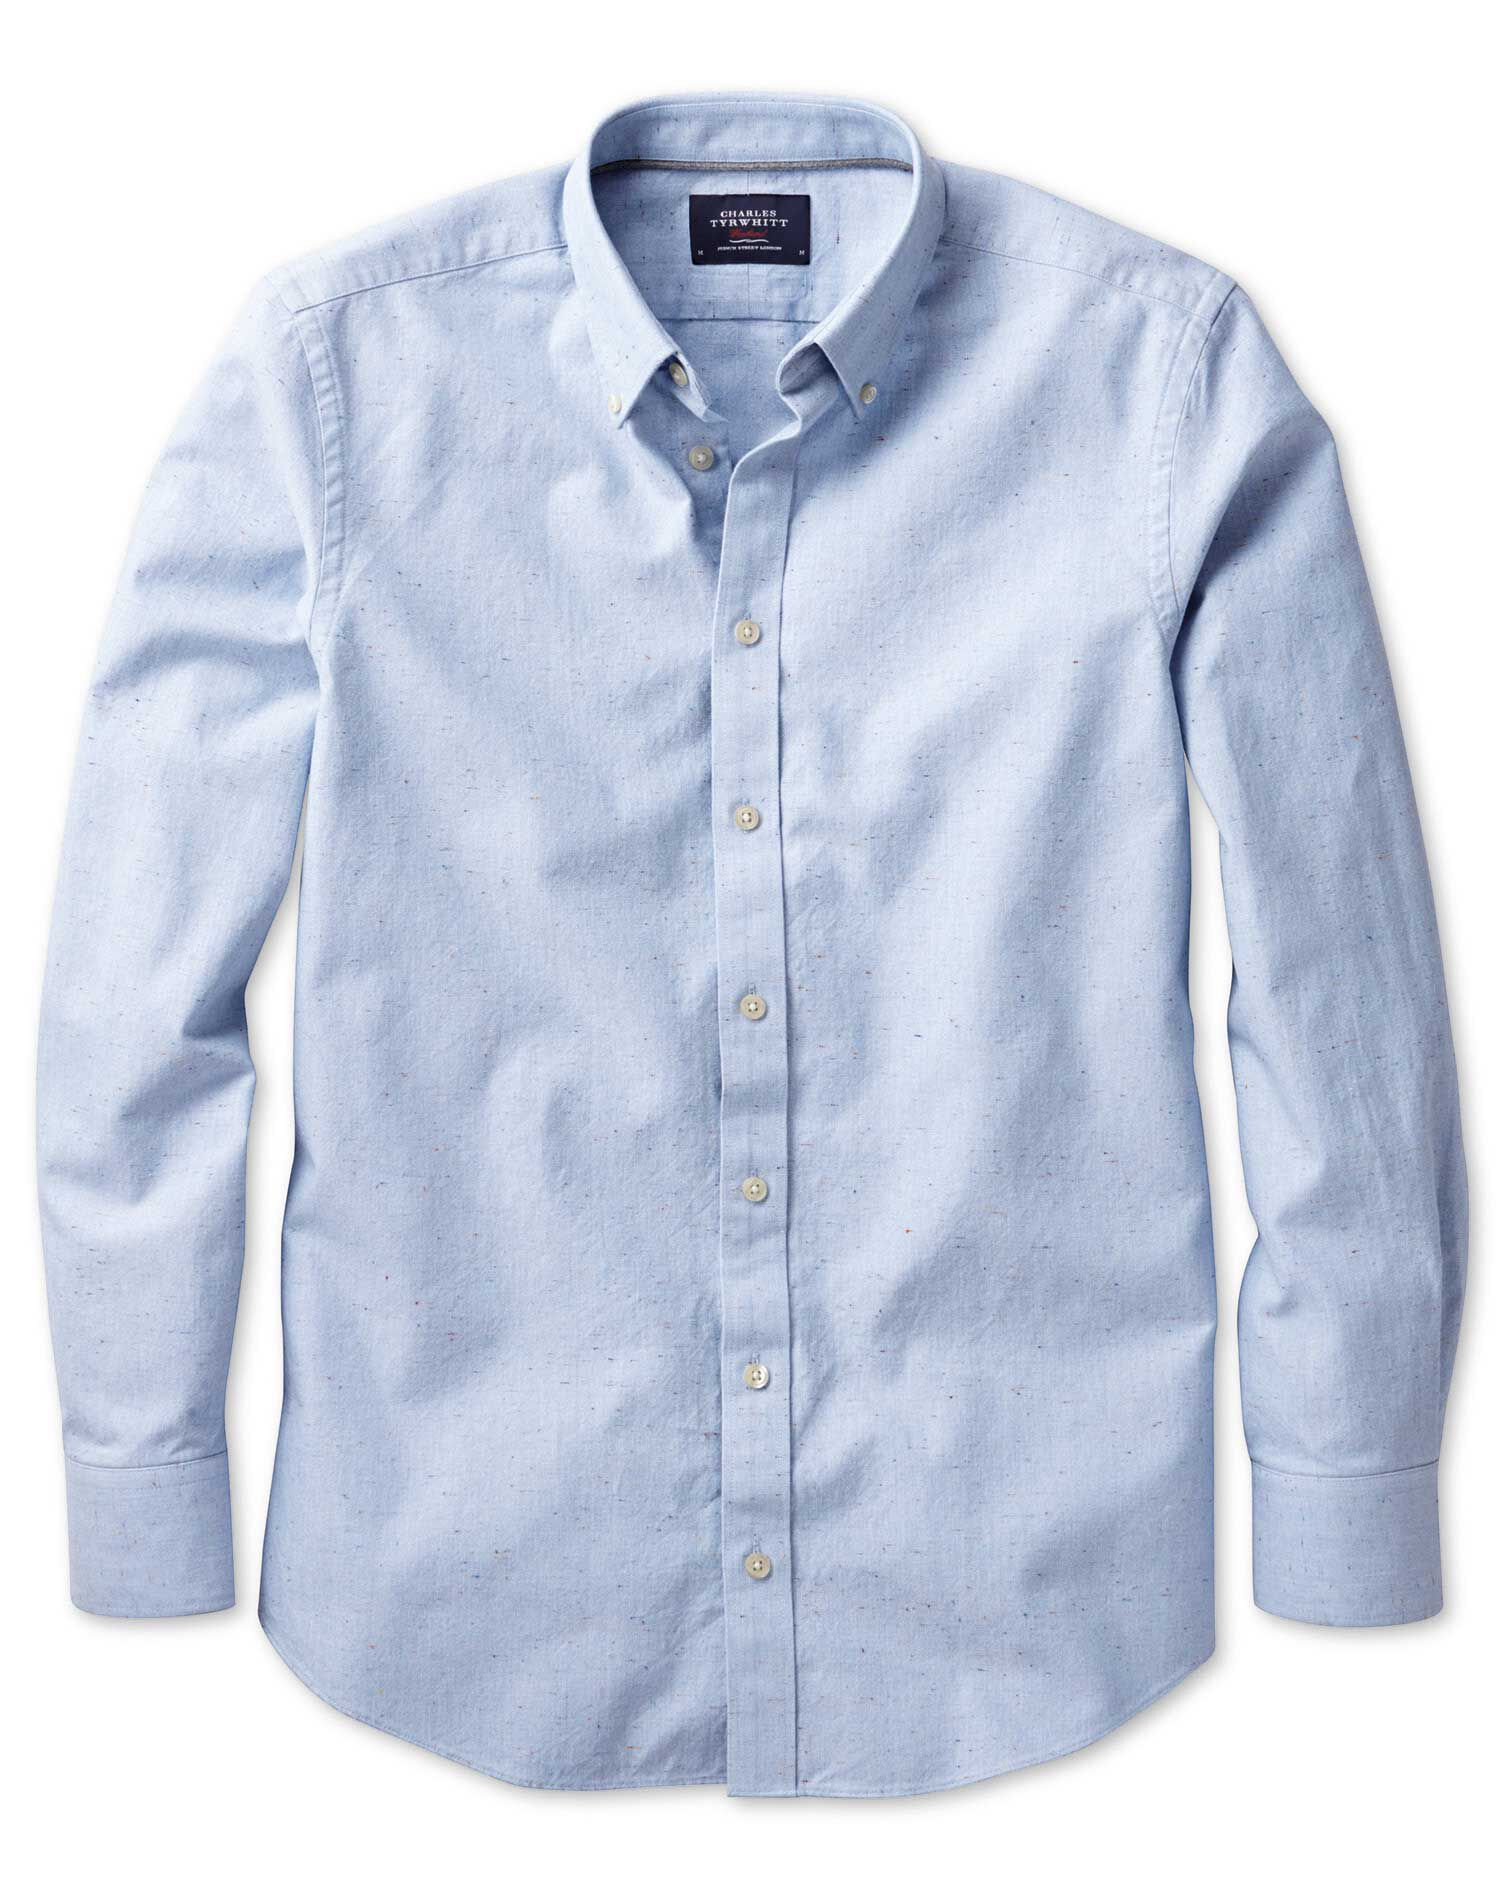 Classic Fit Modern Oxford Sky Blue Fleck Cotton Shirt Single Cuff Size Medium by Charles Tyrwhitt